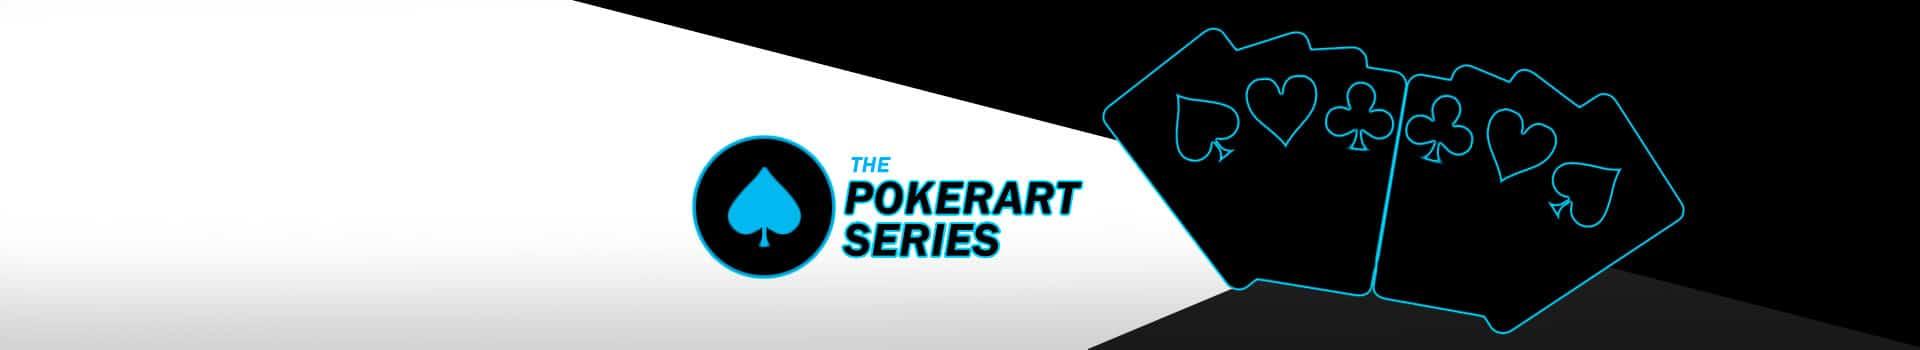 Турнир 888poker Pokerart series